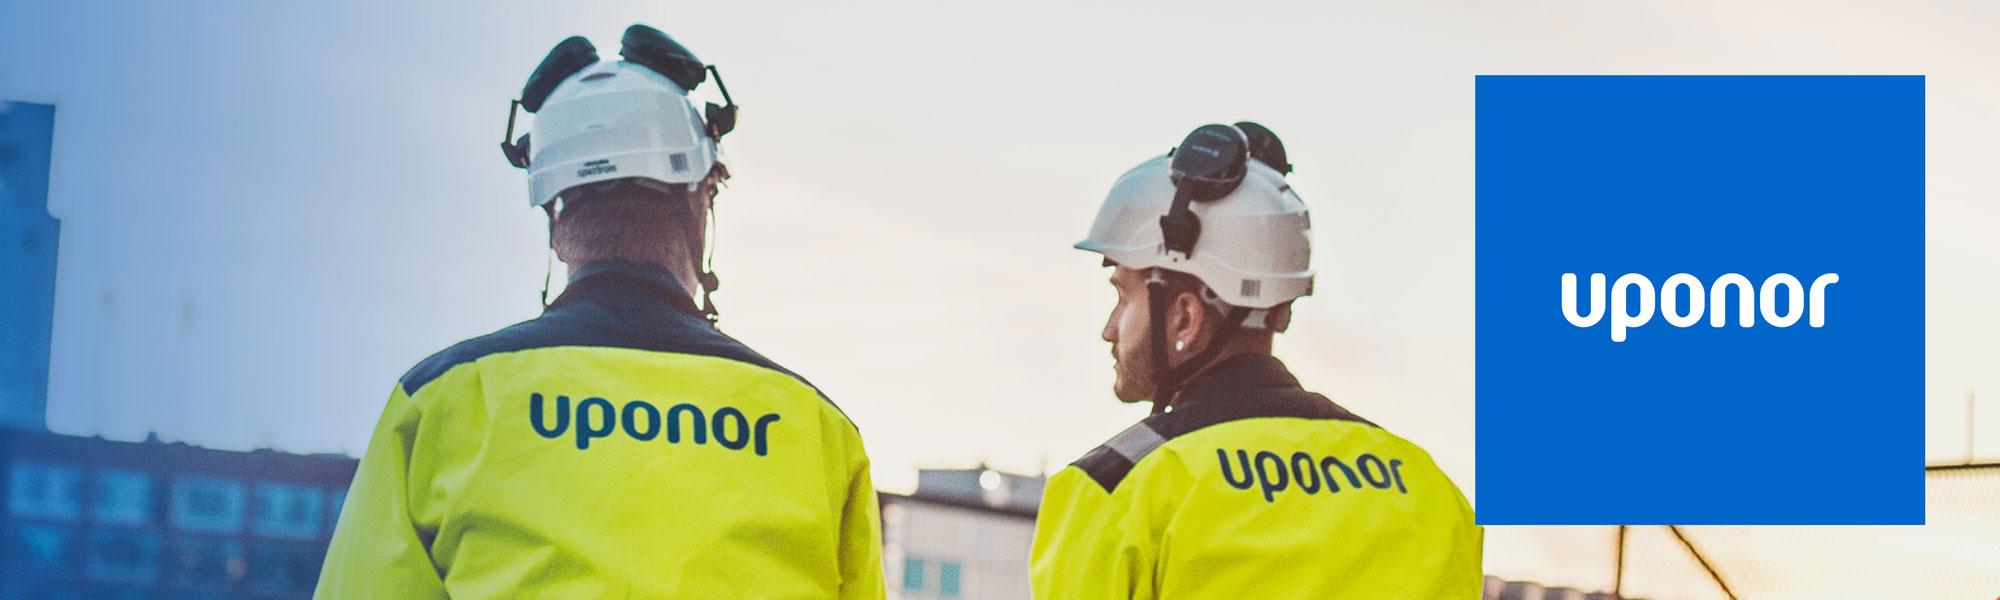 Uponor: Communicate uniformly across Europe